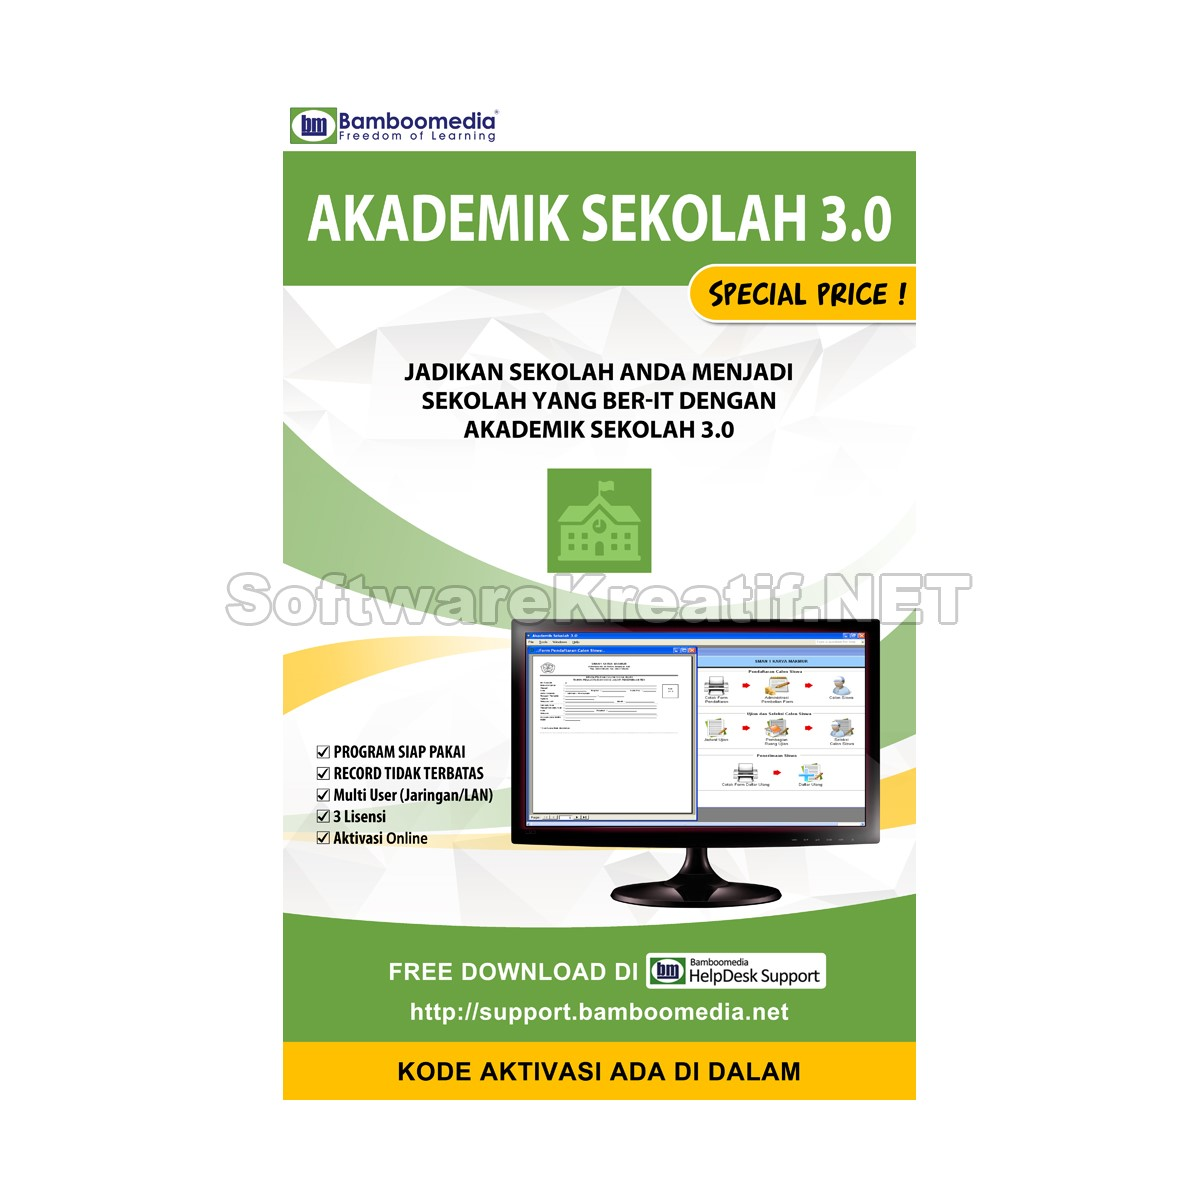 kotak baru akademik sekolah 3.0 lengkap